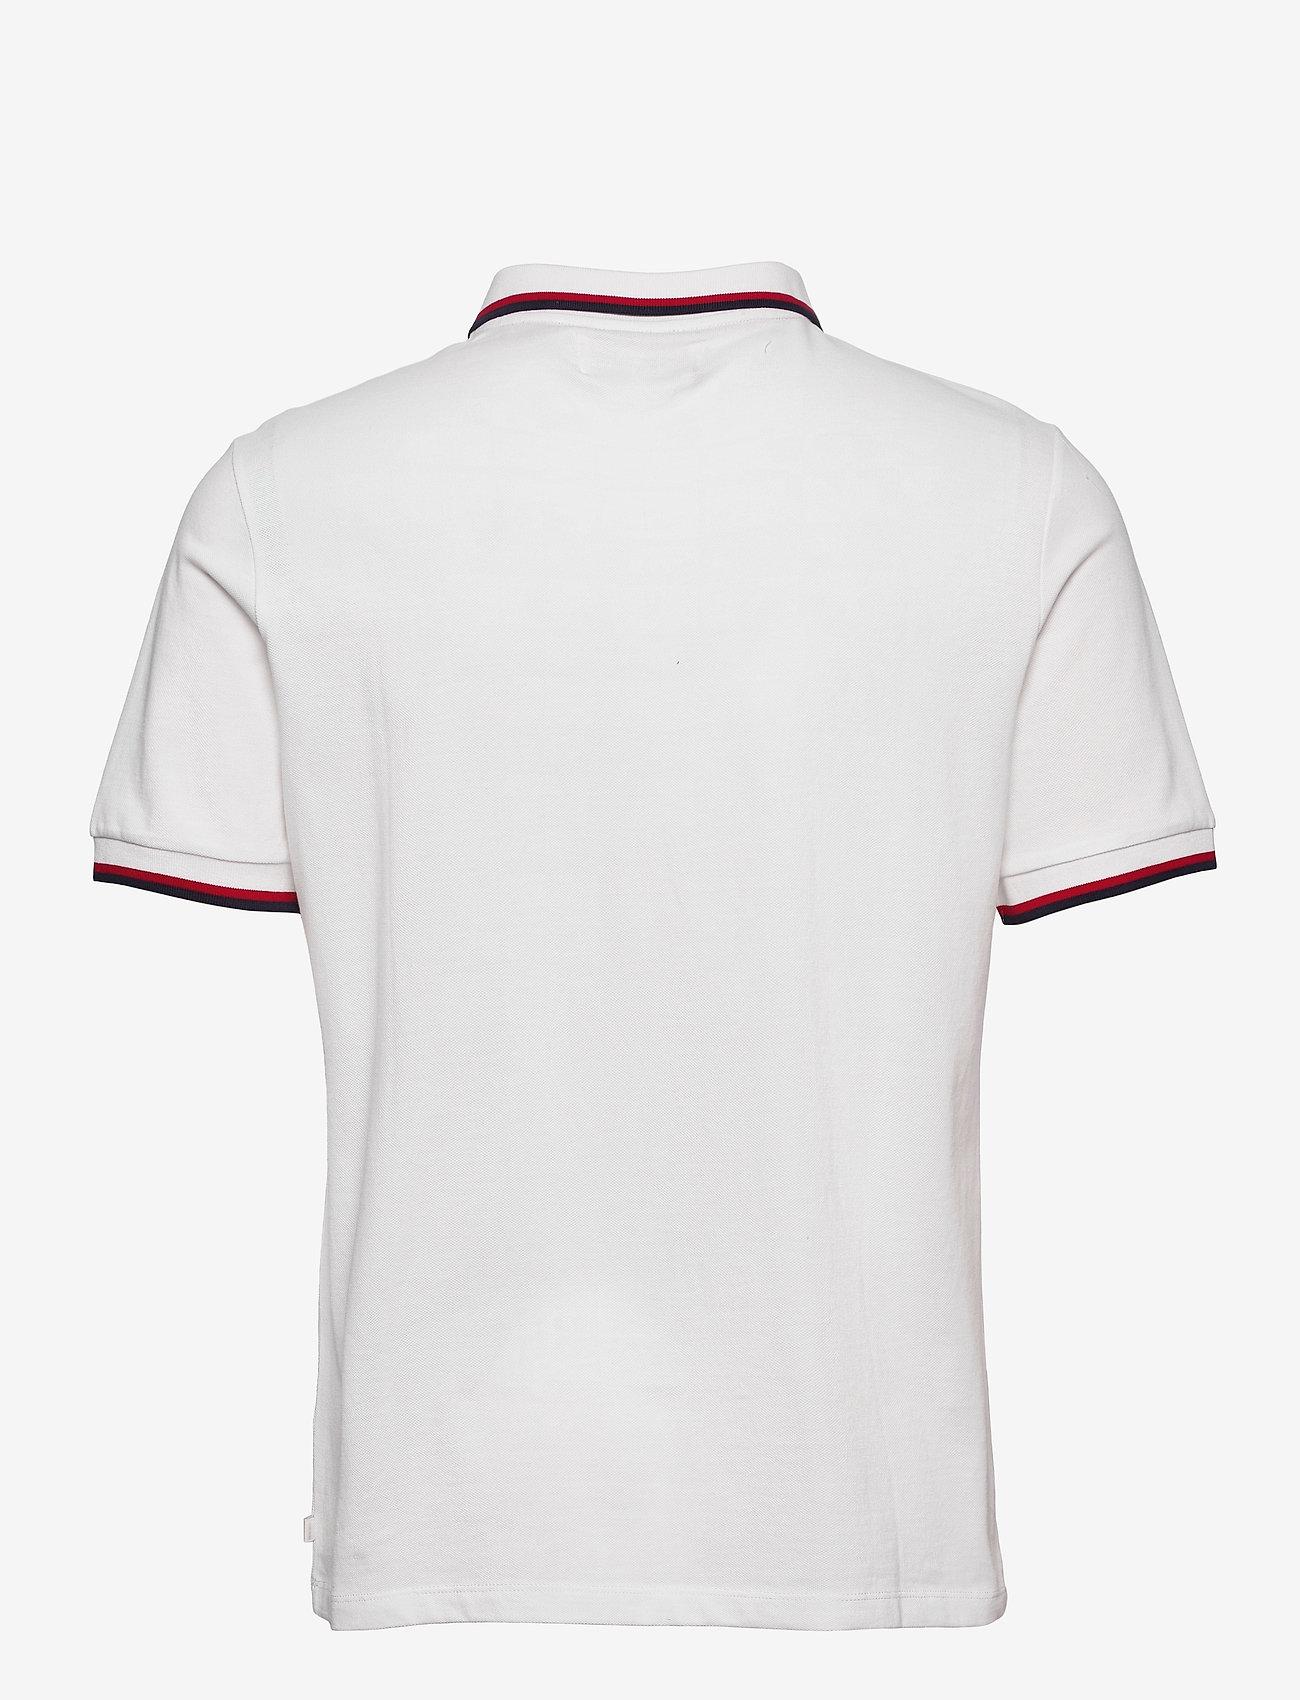 FRAM - Polo Piquet - kurzärmelig - blanc de blanc - 1